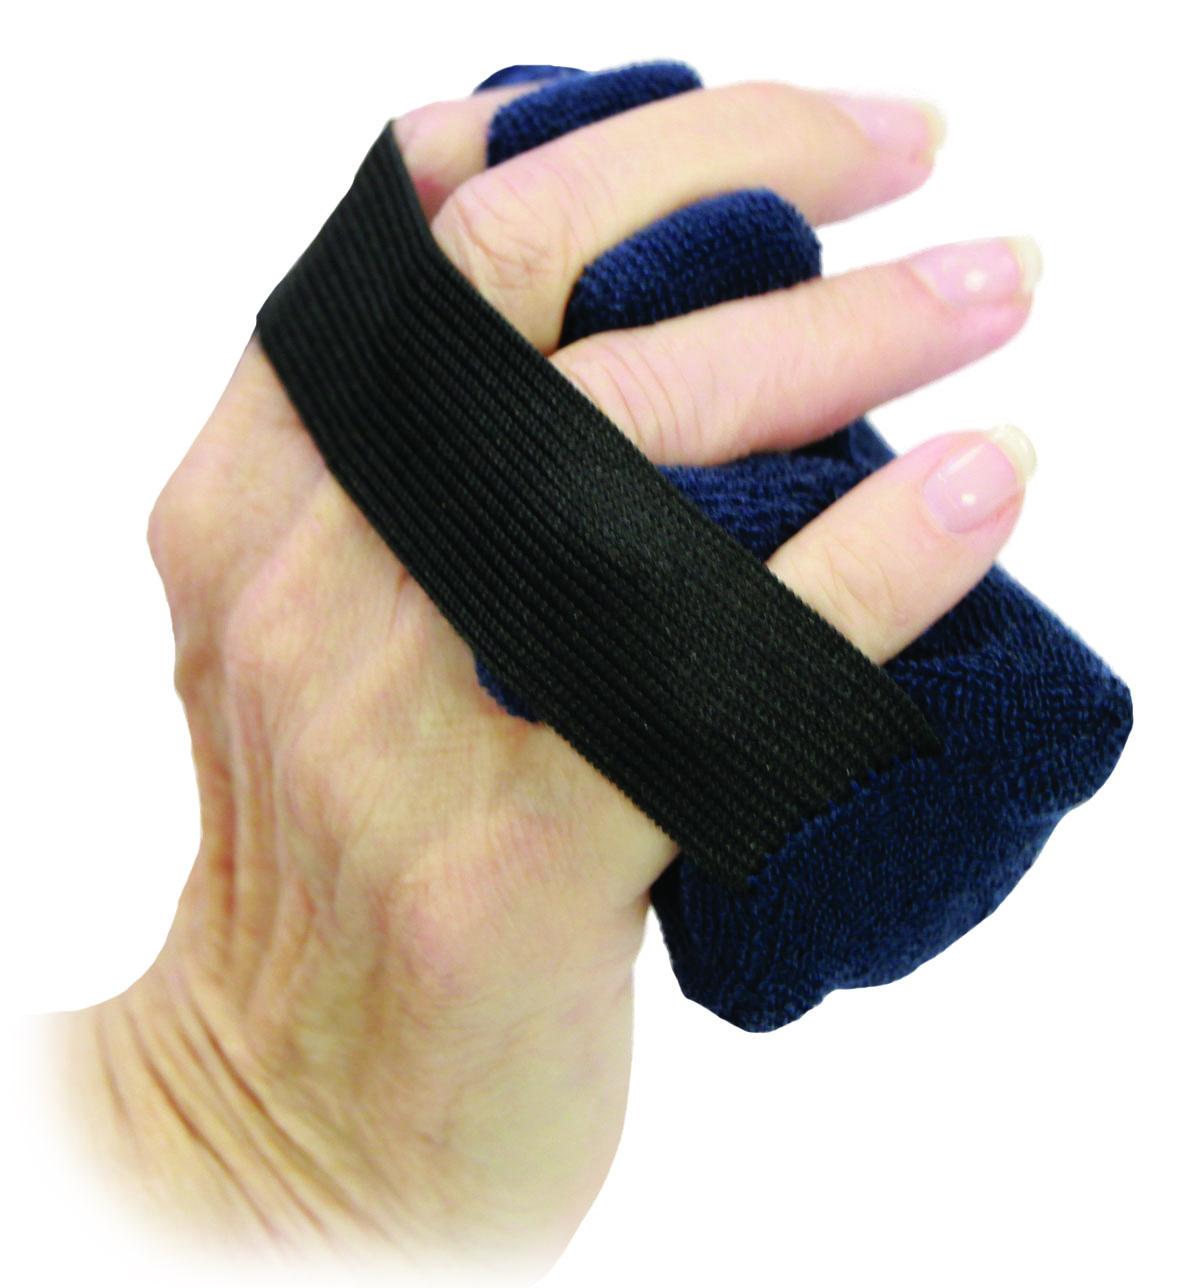 contracture hand finger comfy cushion splint flexion contractures brace splints orthosis stroke extension upper patients limb neurorehabdirectory splinting position boot